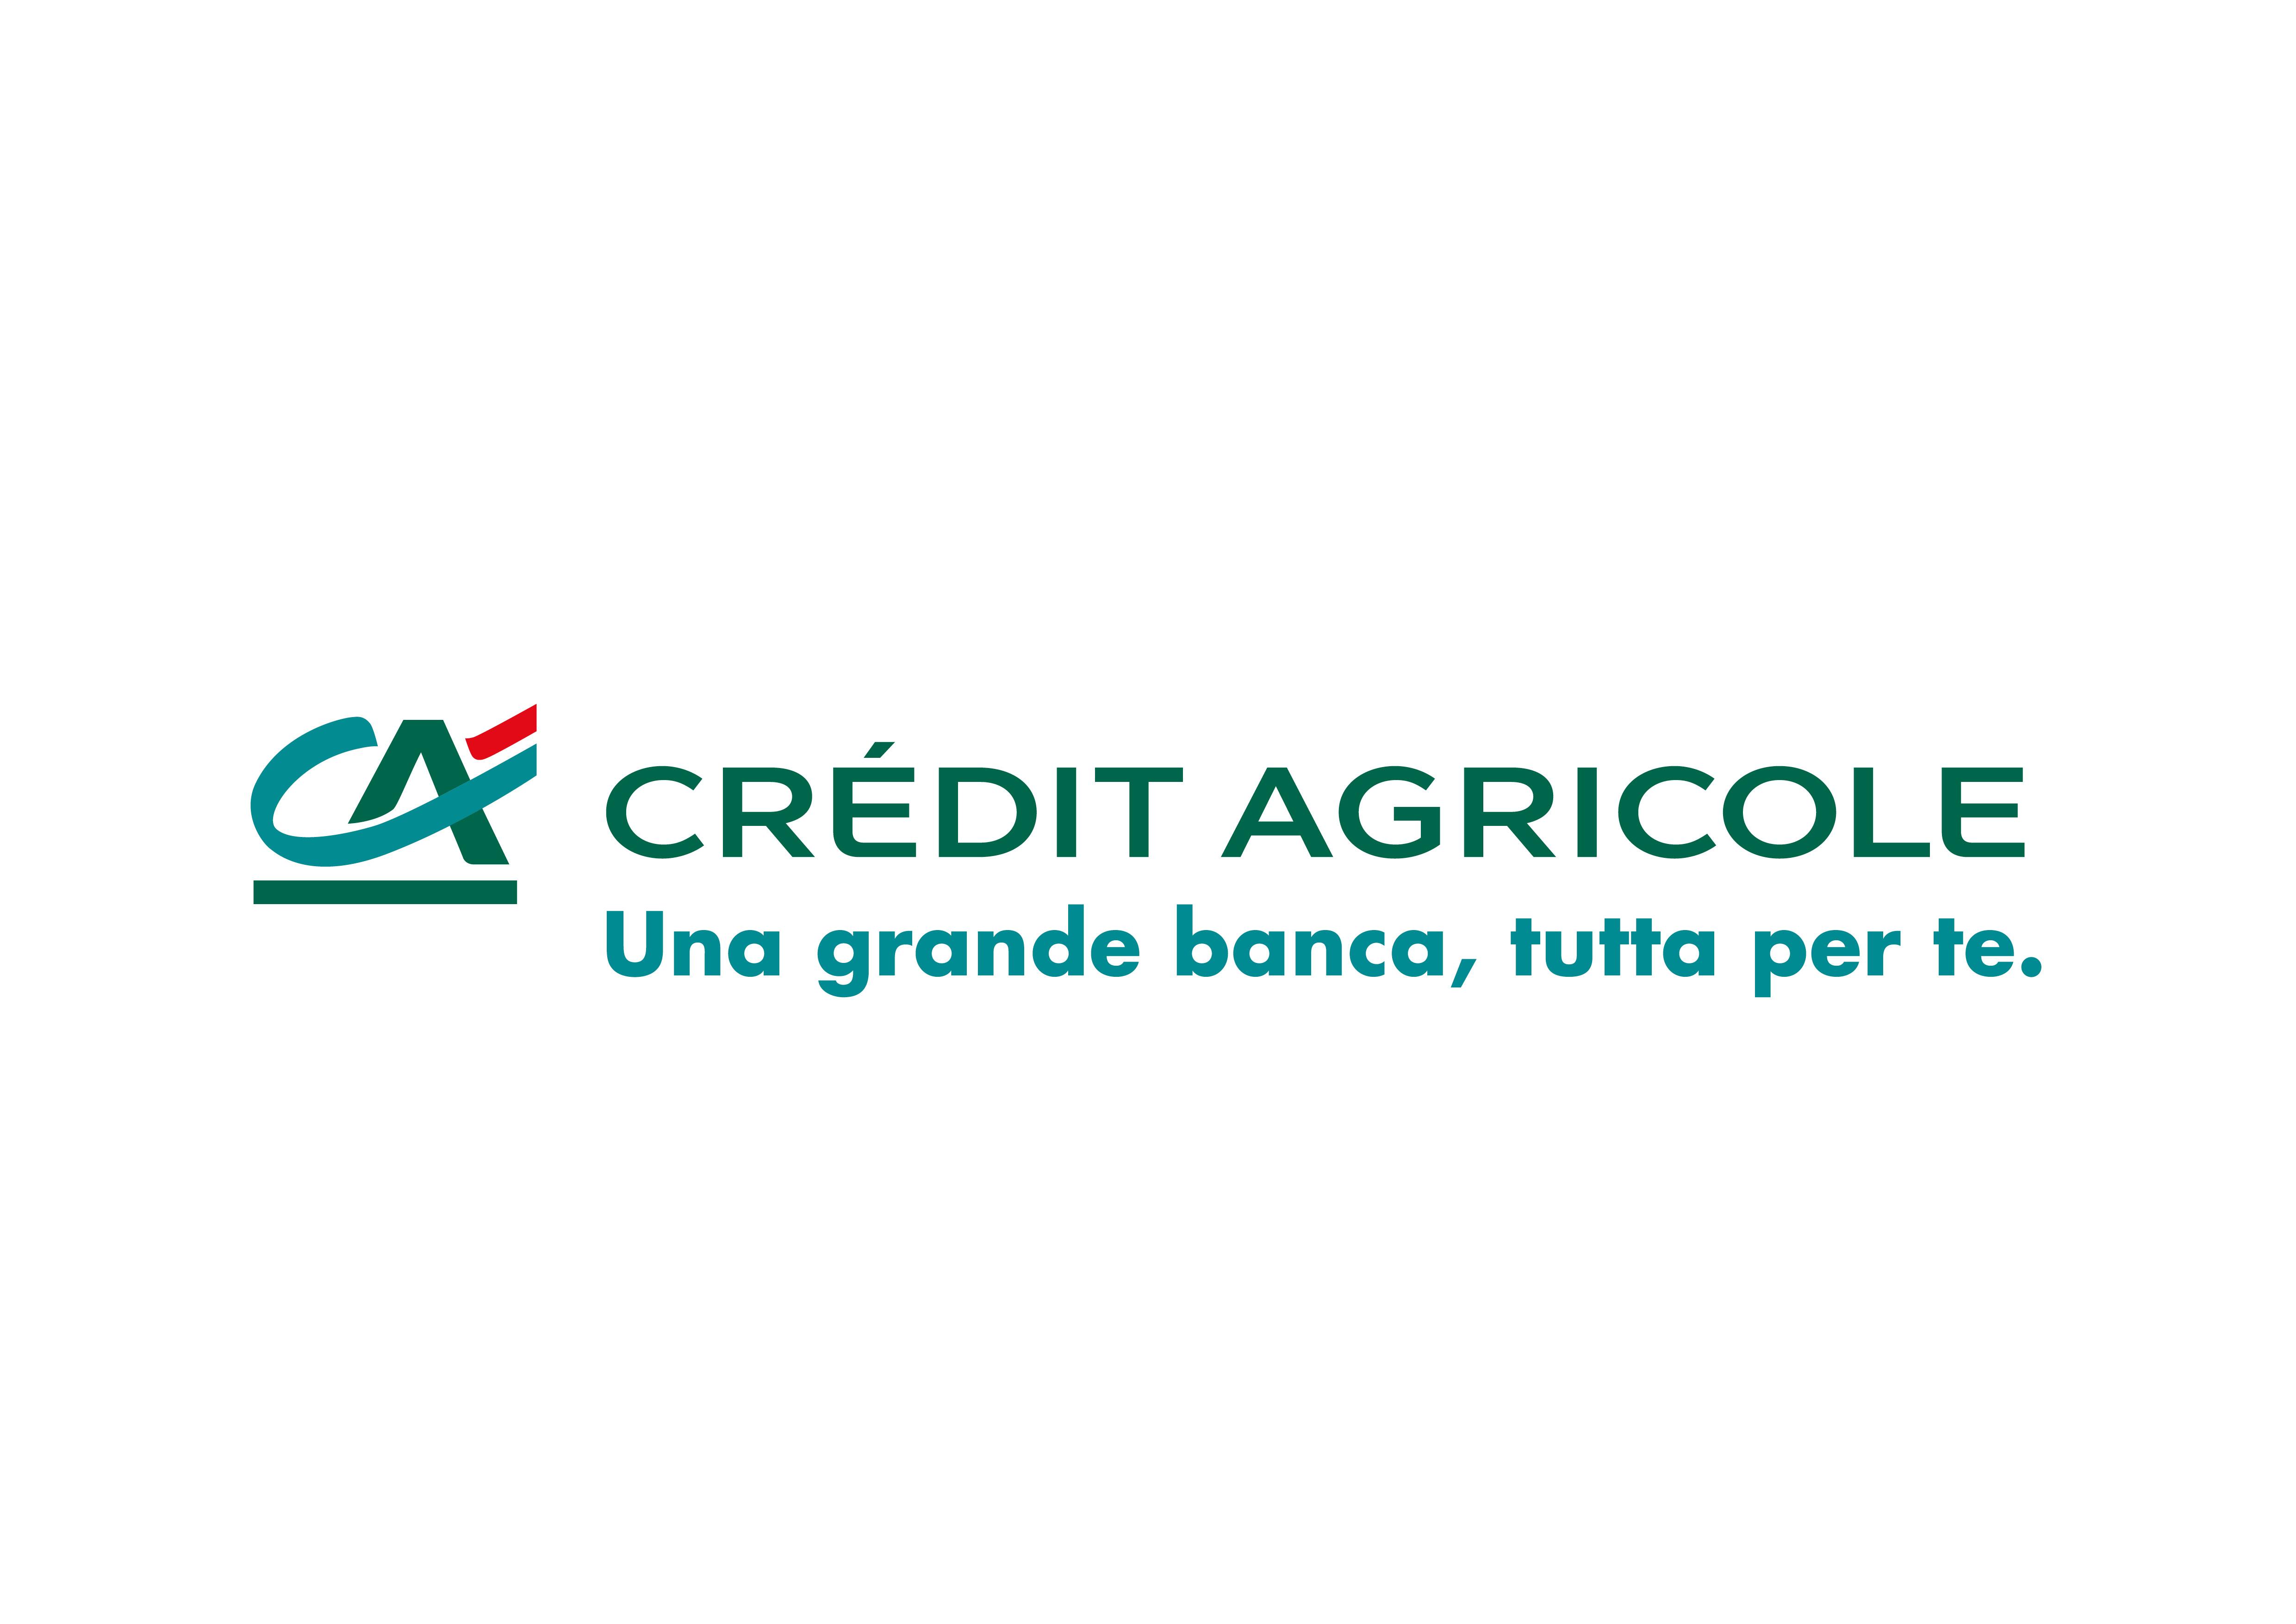 Crédit Agricole Italia S.p.a.